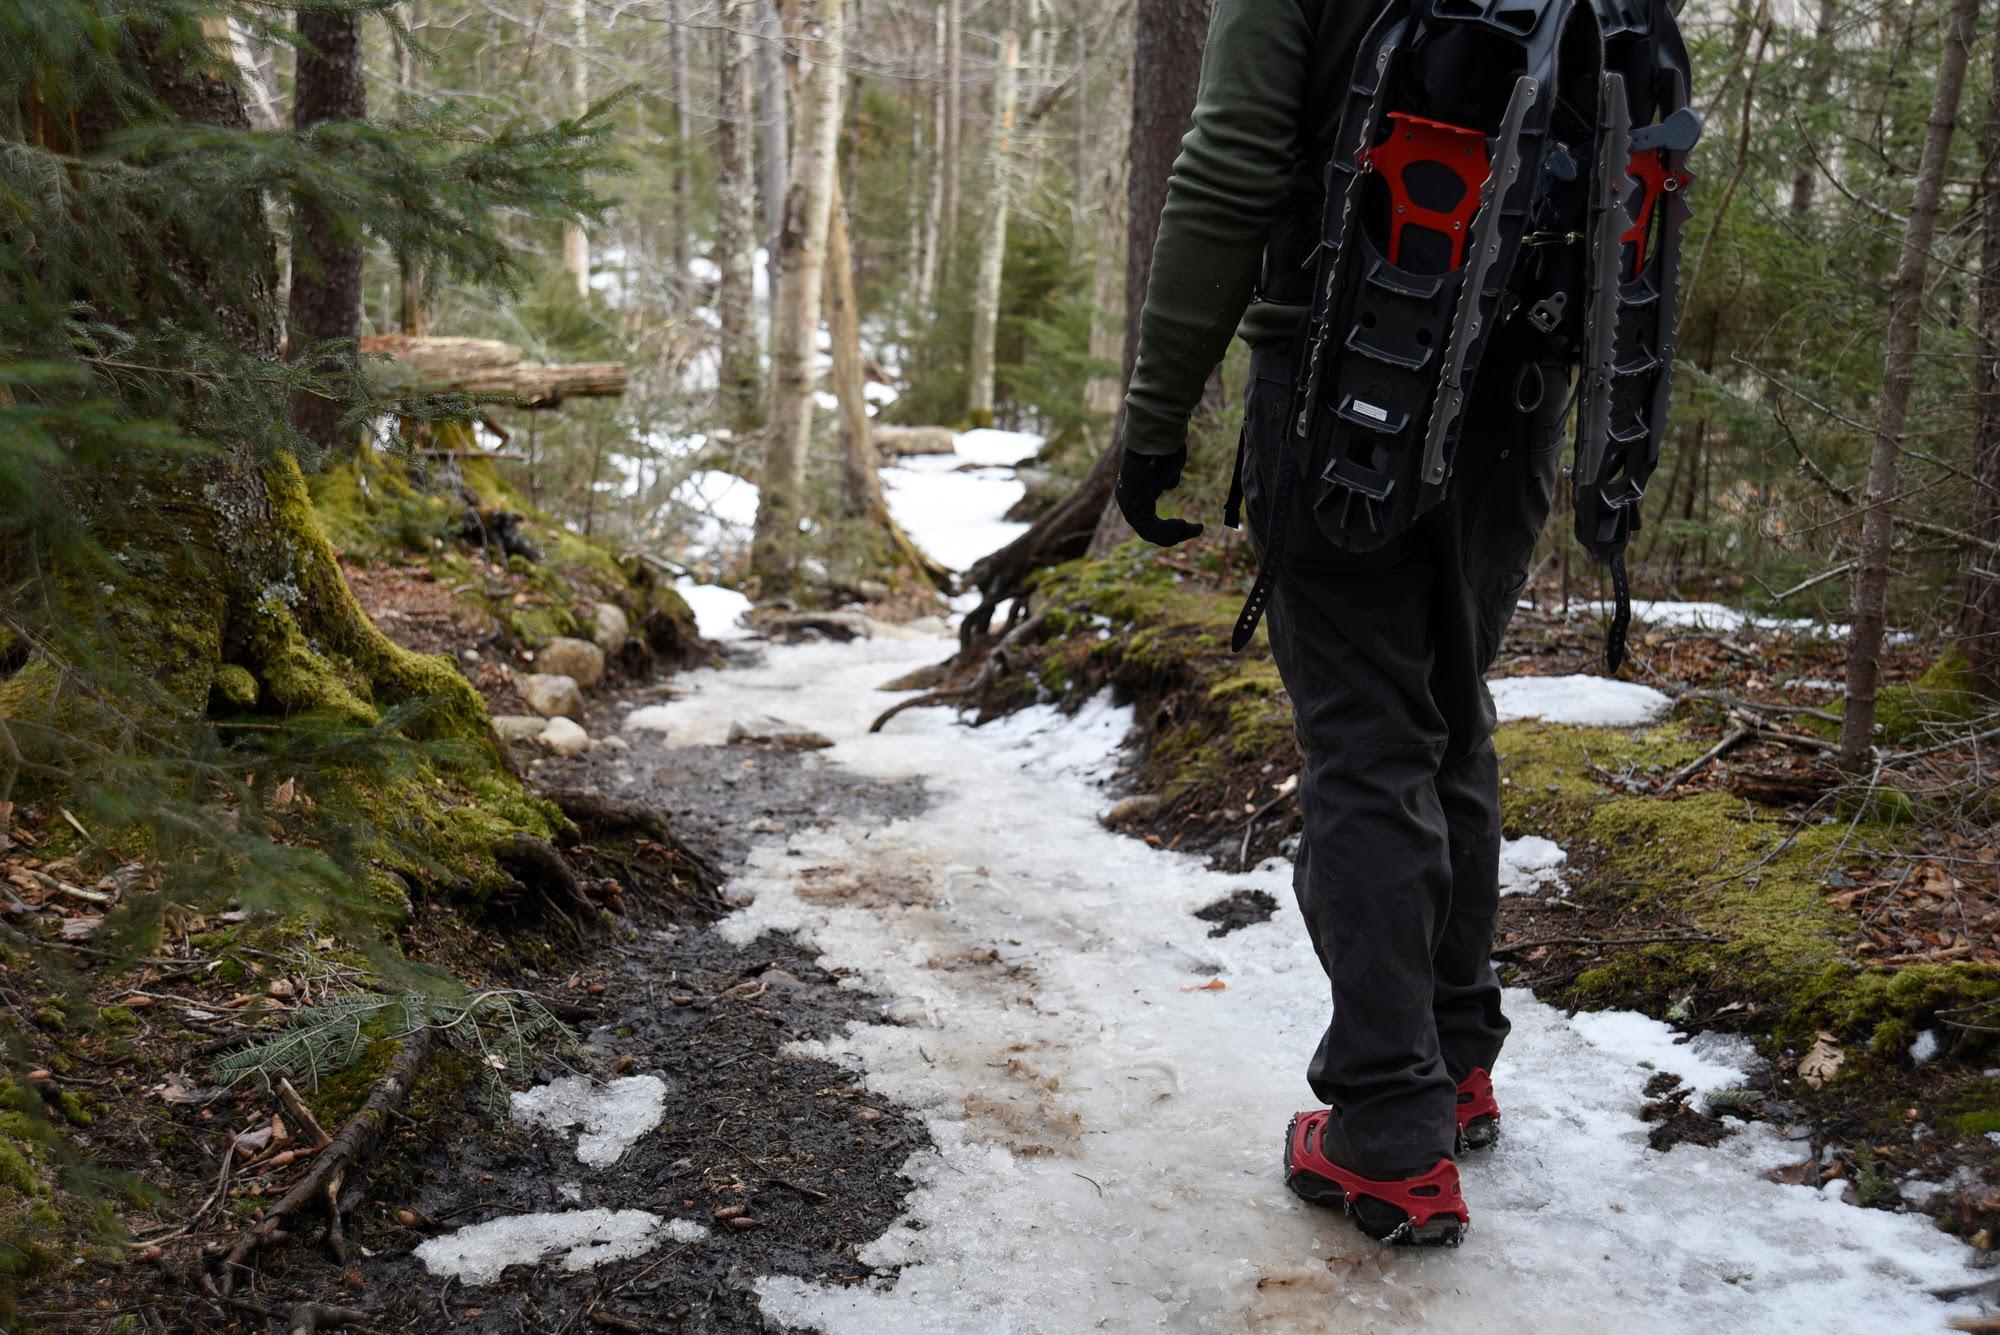 Muddy Trails Advisory